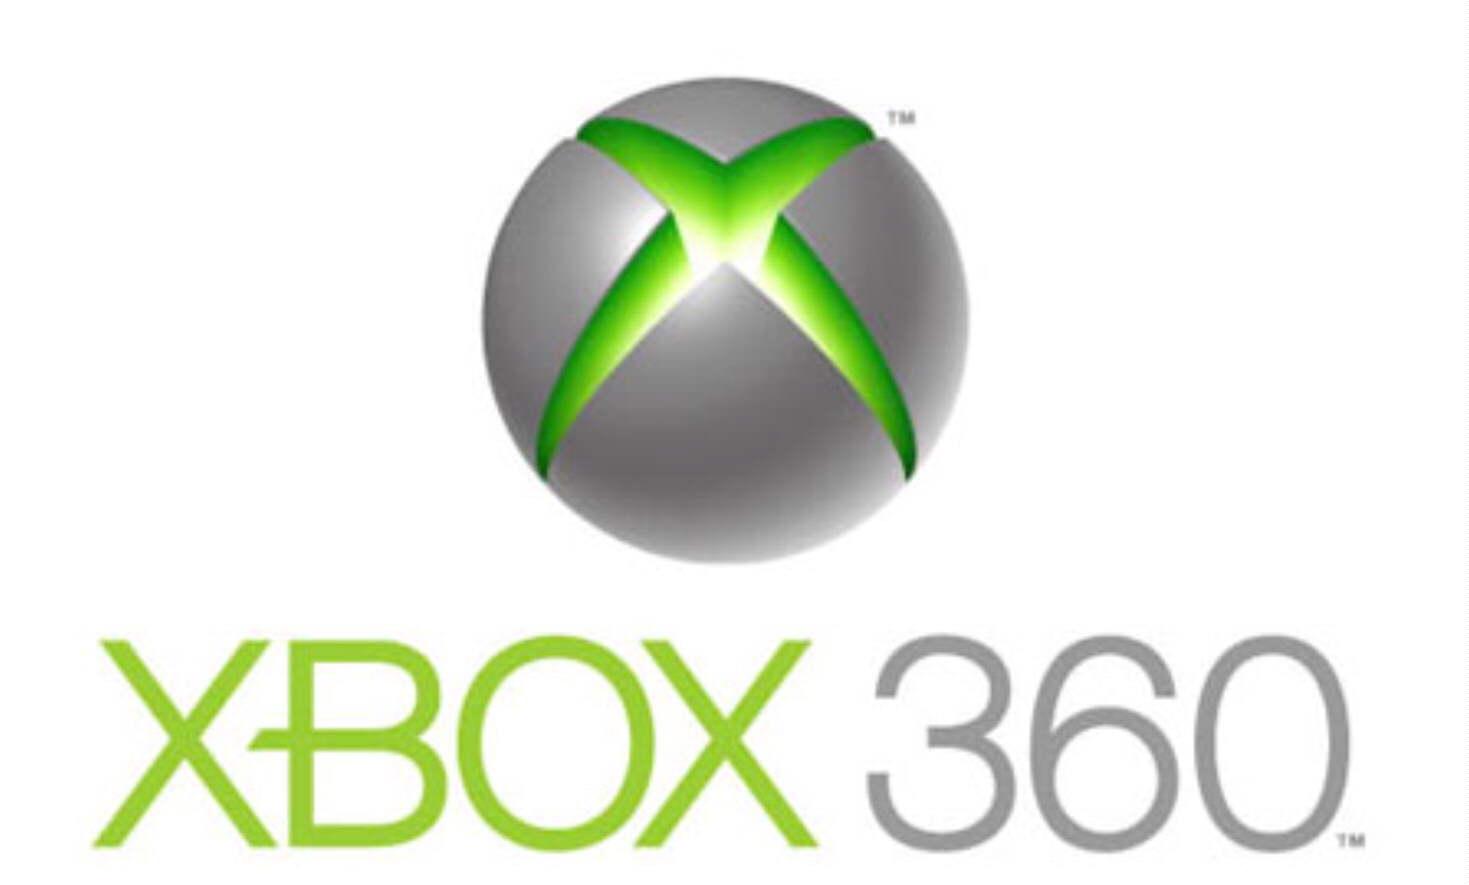 Xbox 360 Leads U.S. Console Market